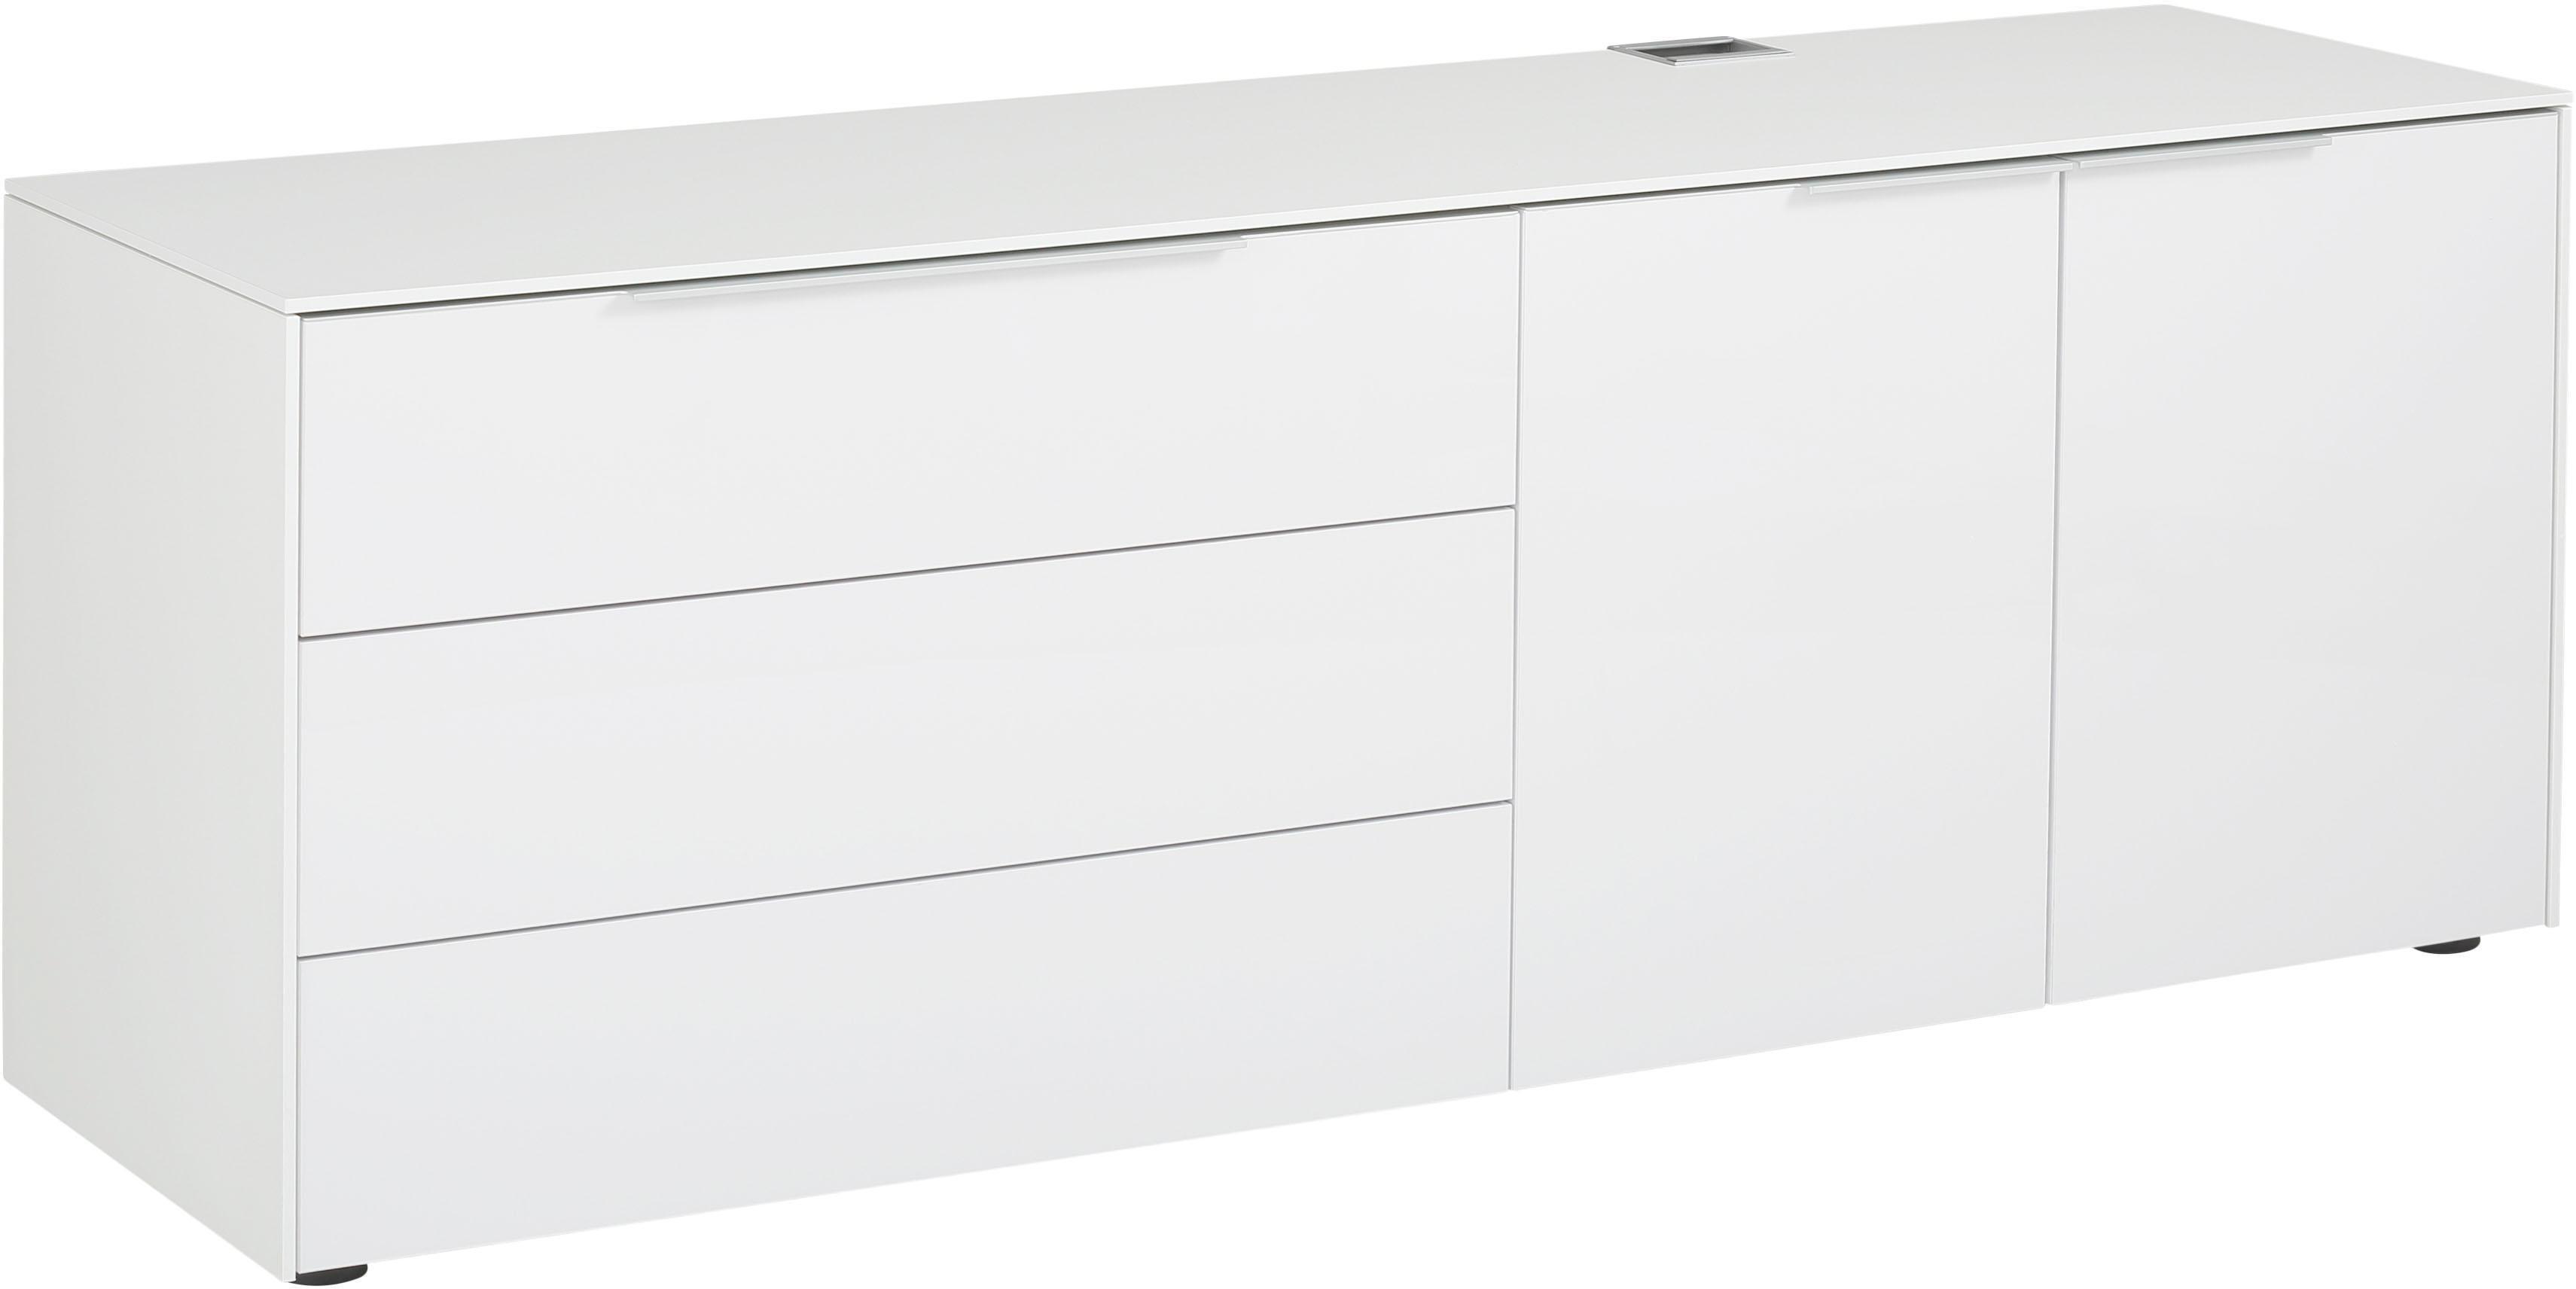 Maja Möbel Container »5505 eDJUST« | Büro > Büroschränke > Container | Weiß - Matt - Glanz | Sonoma - Eiche - Lack - Melamin | Maja Möbel